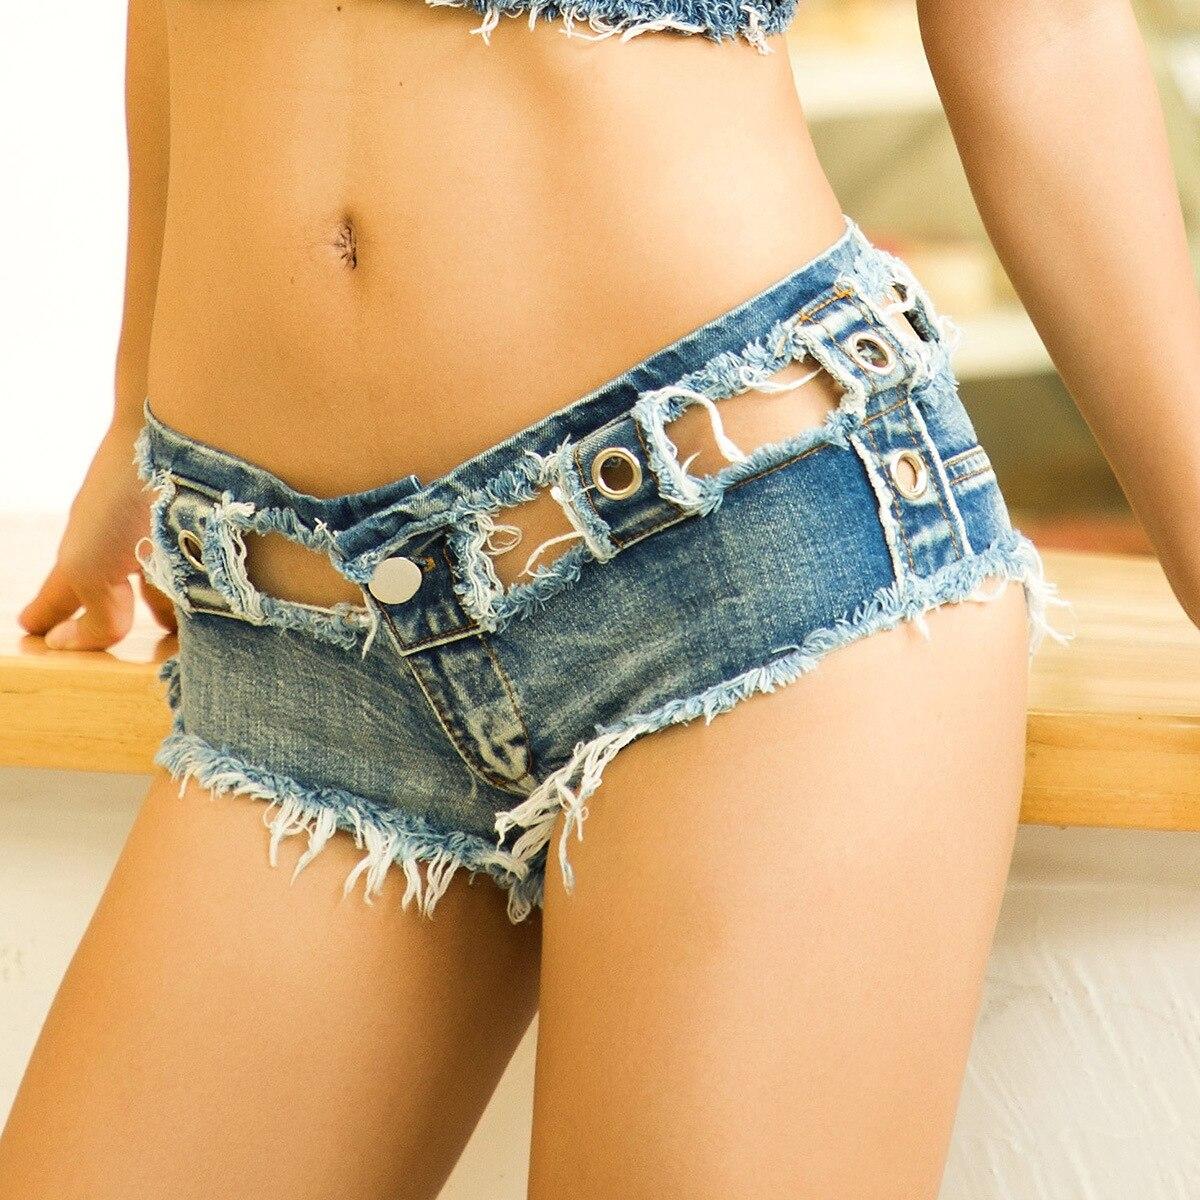 1pcs Women's Super Denim Shorts 2020 Summer Denim Cotton Splicing Broken Hole Shorts Ladies Skinny Sexy Club Super Short Jeans